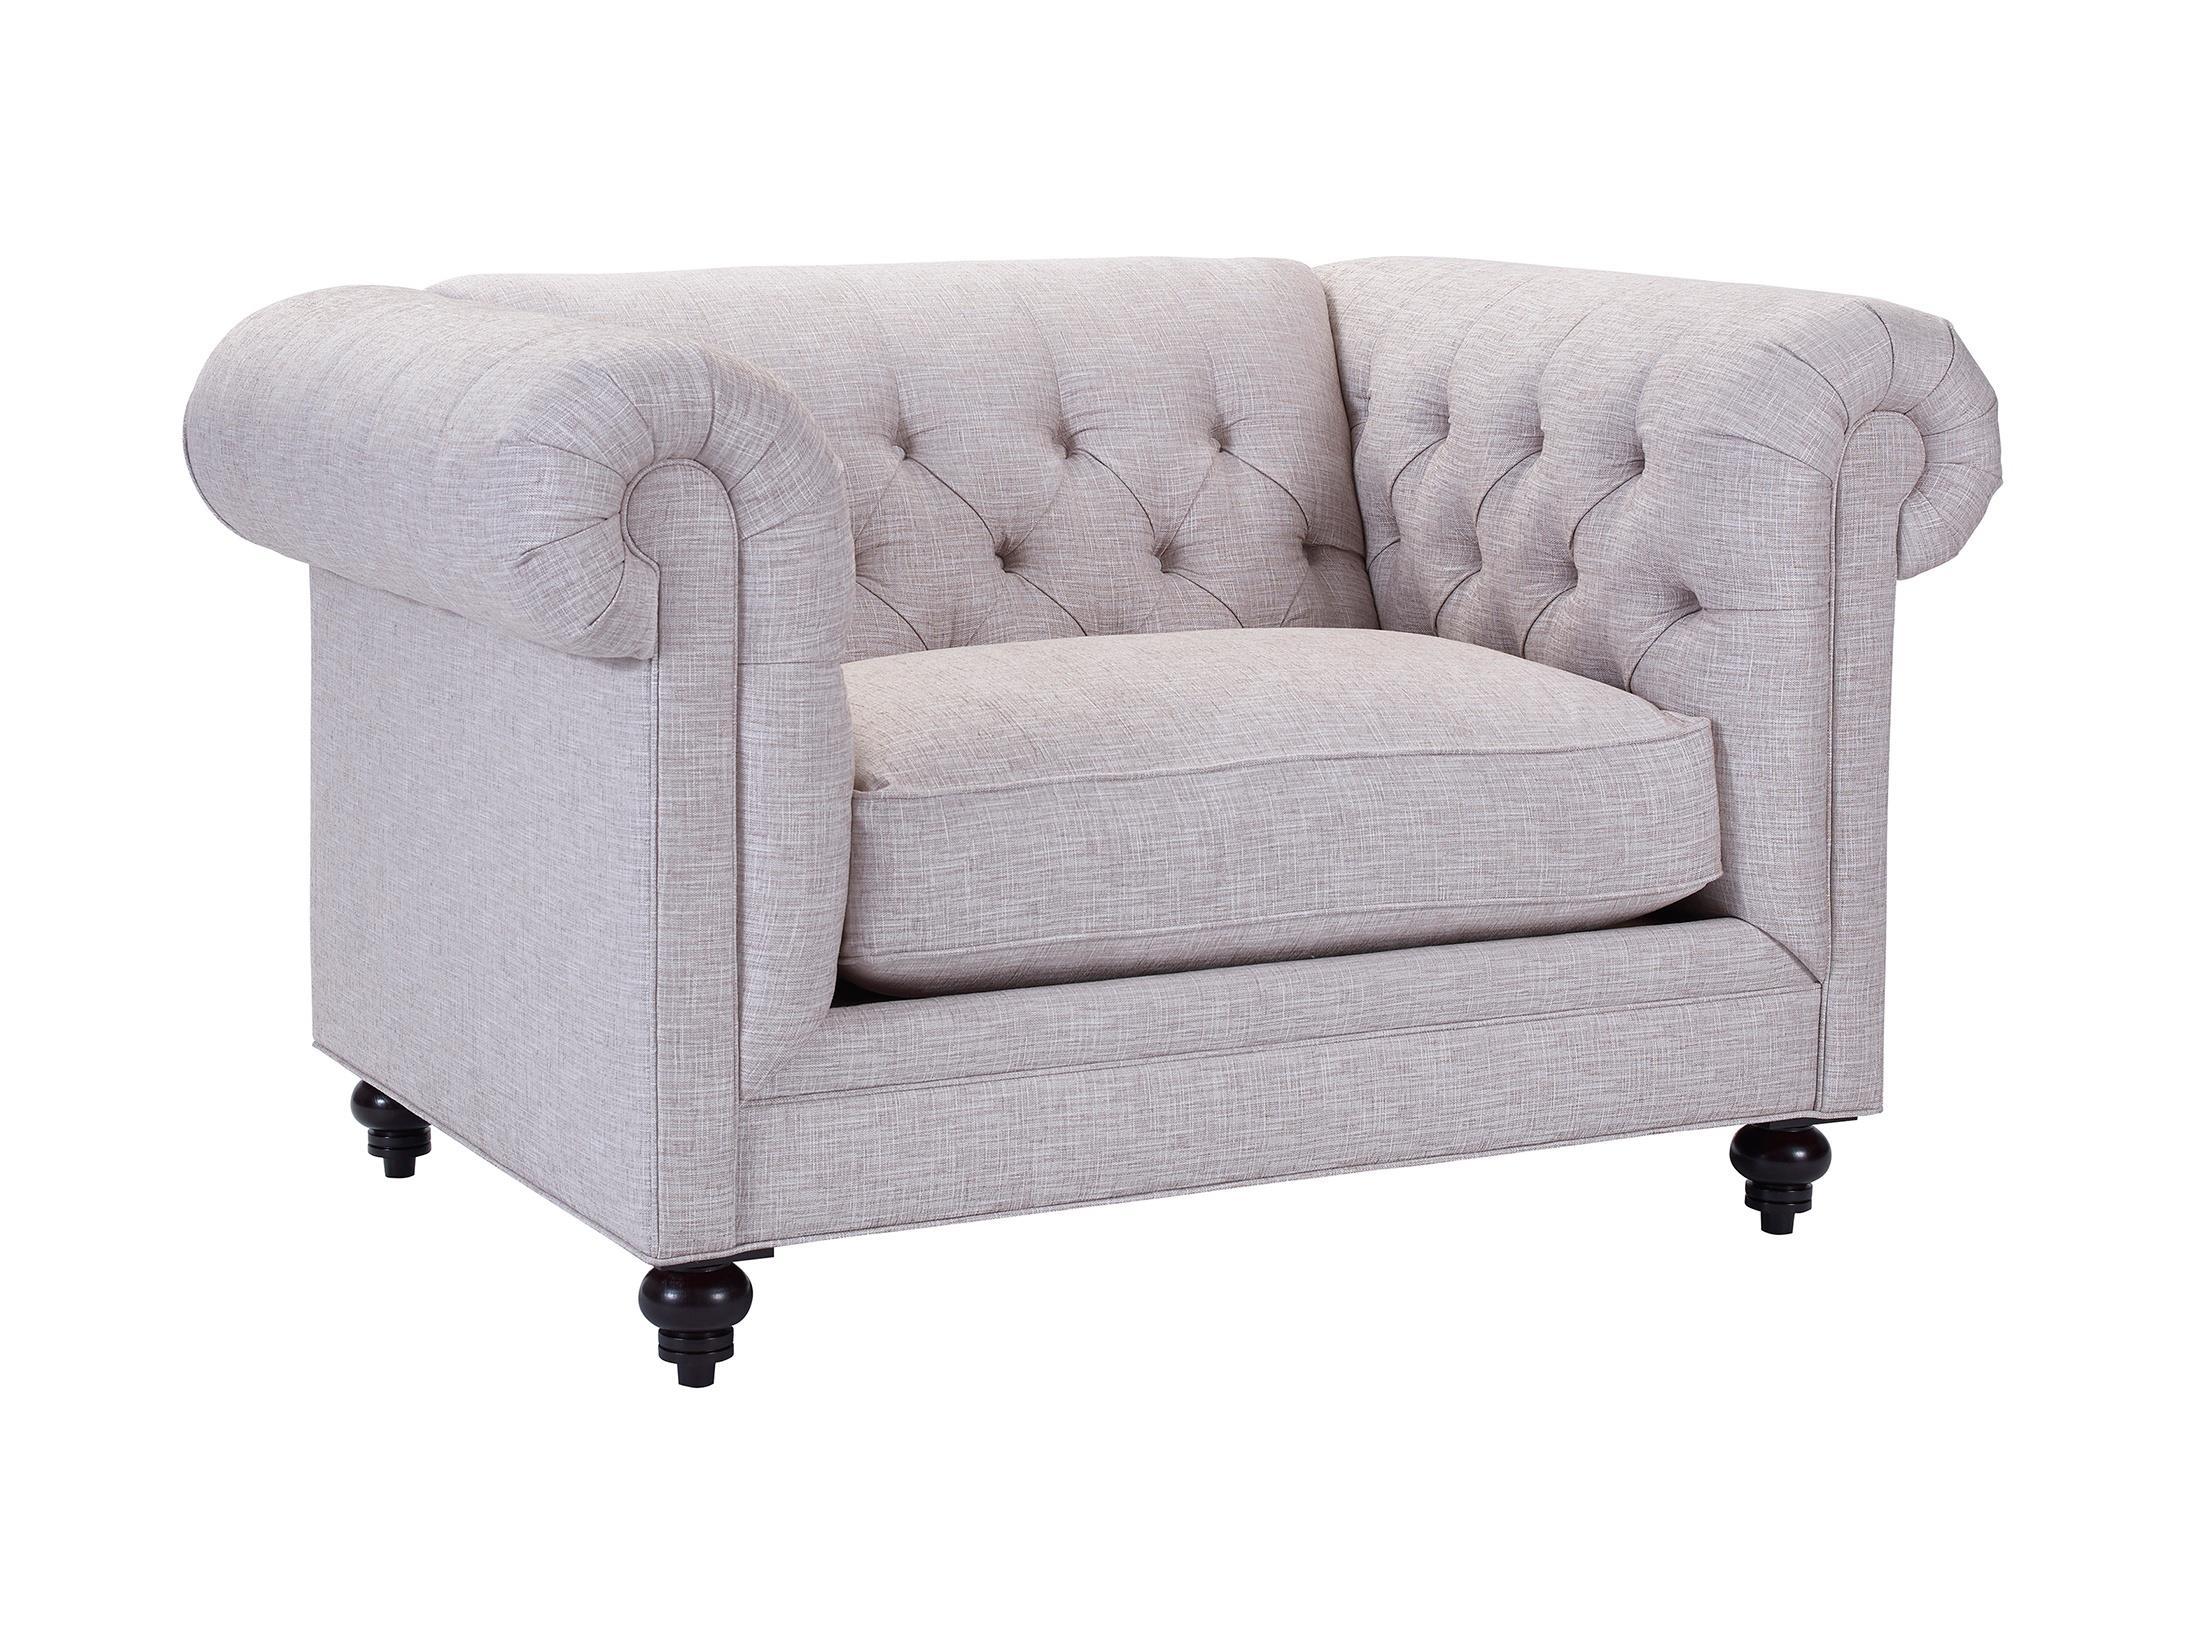 Broyhill Furniture Heath Chair & 1/2 - Item Number: 4268-0-4620-80